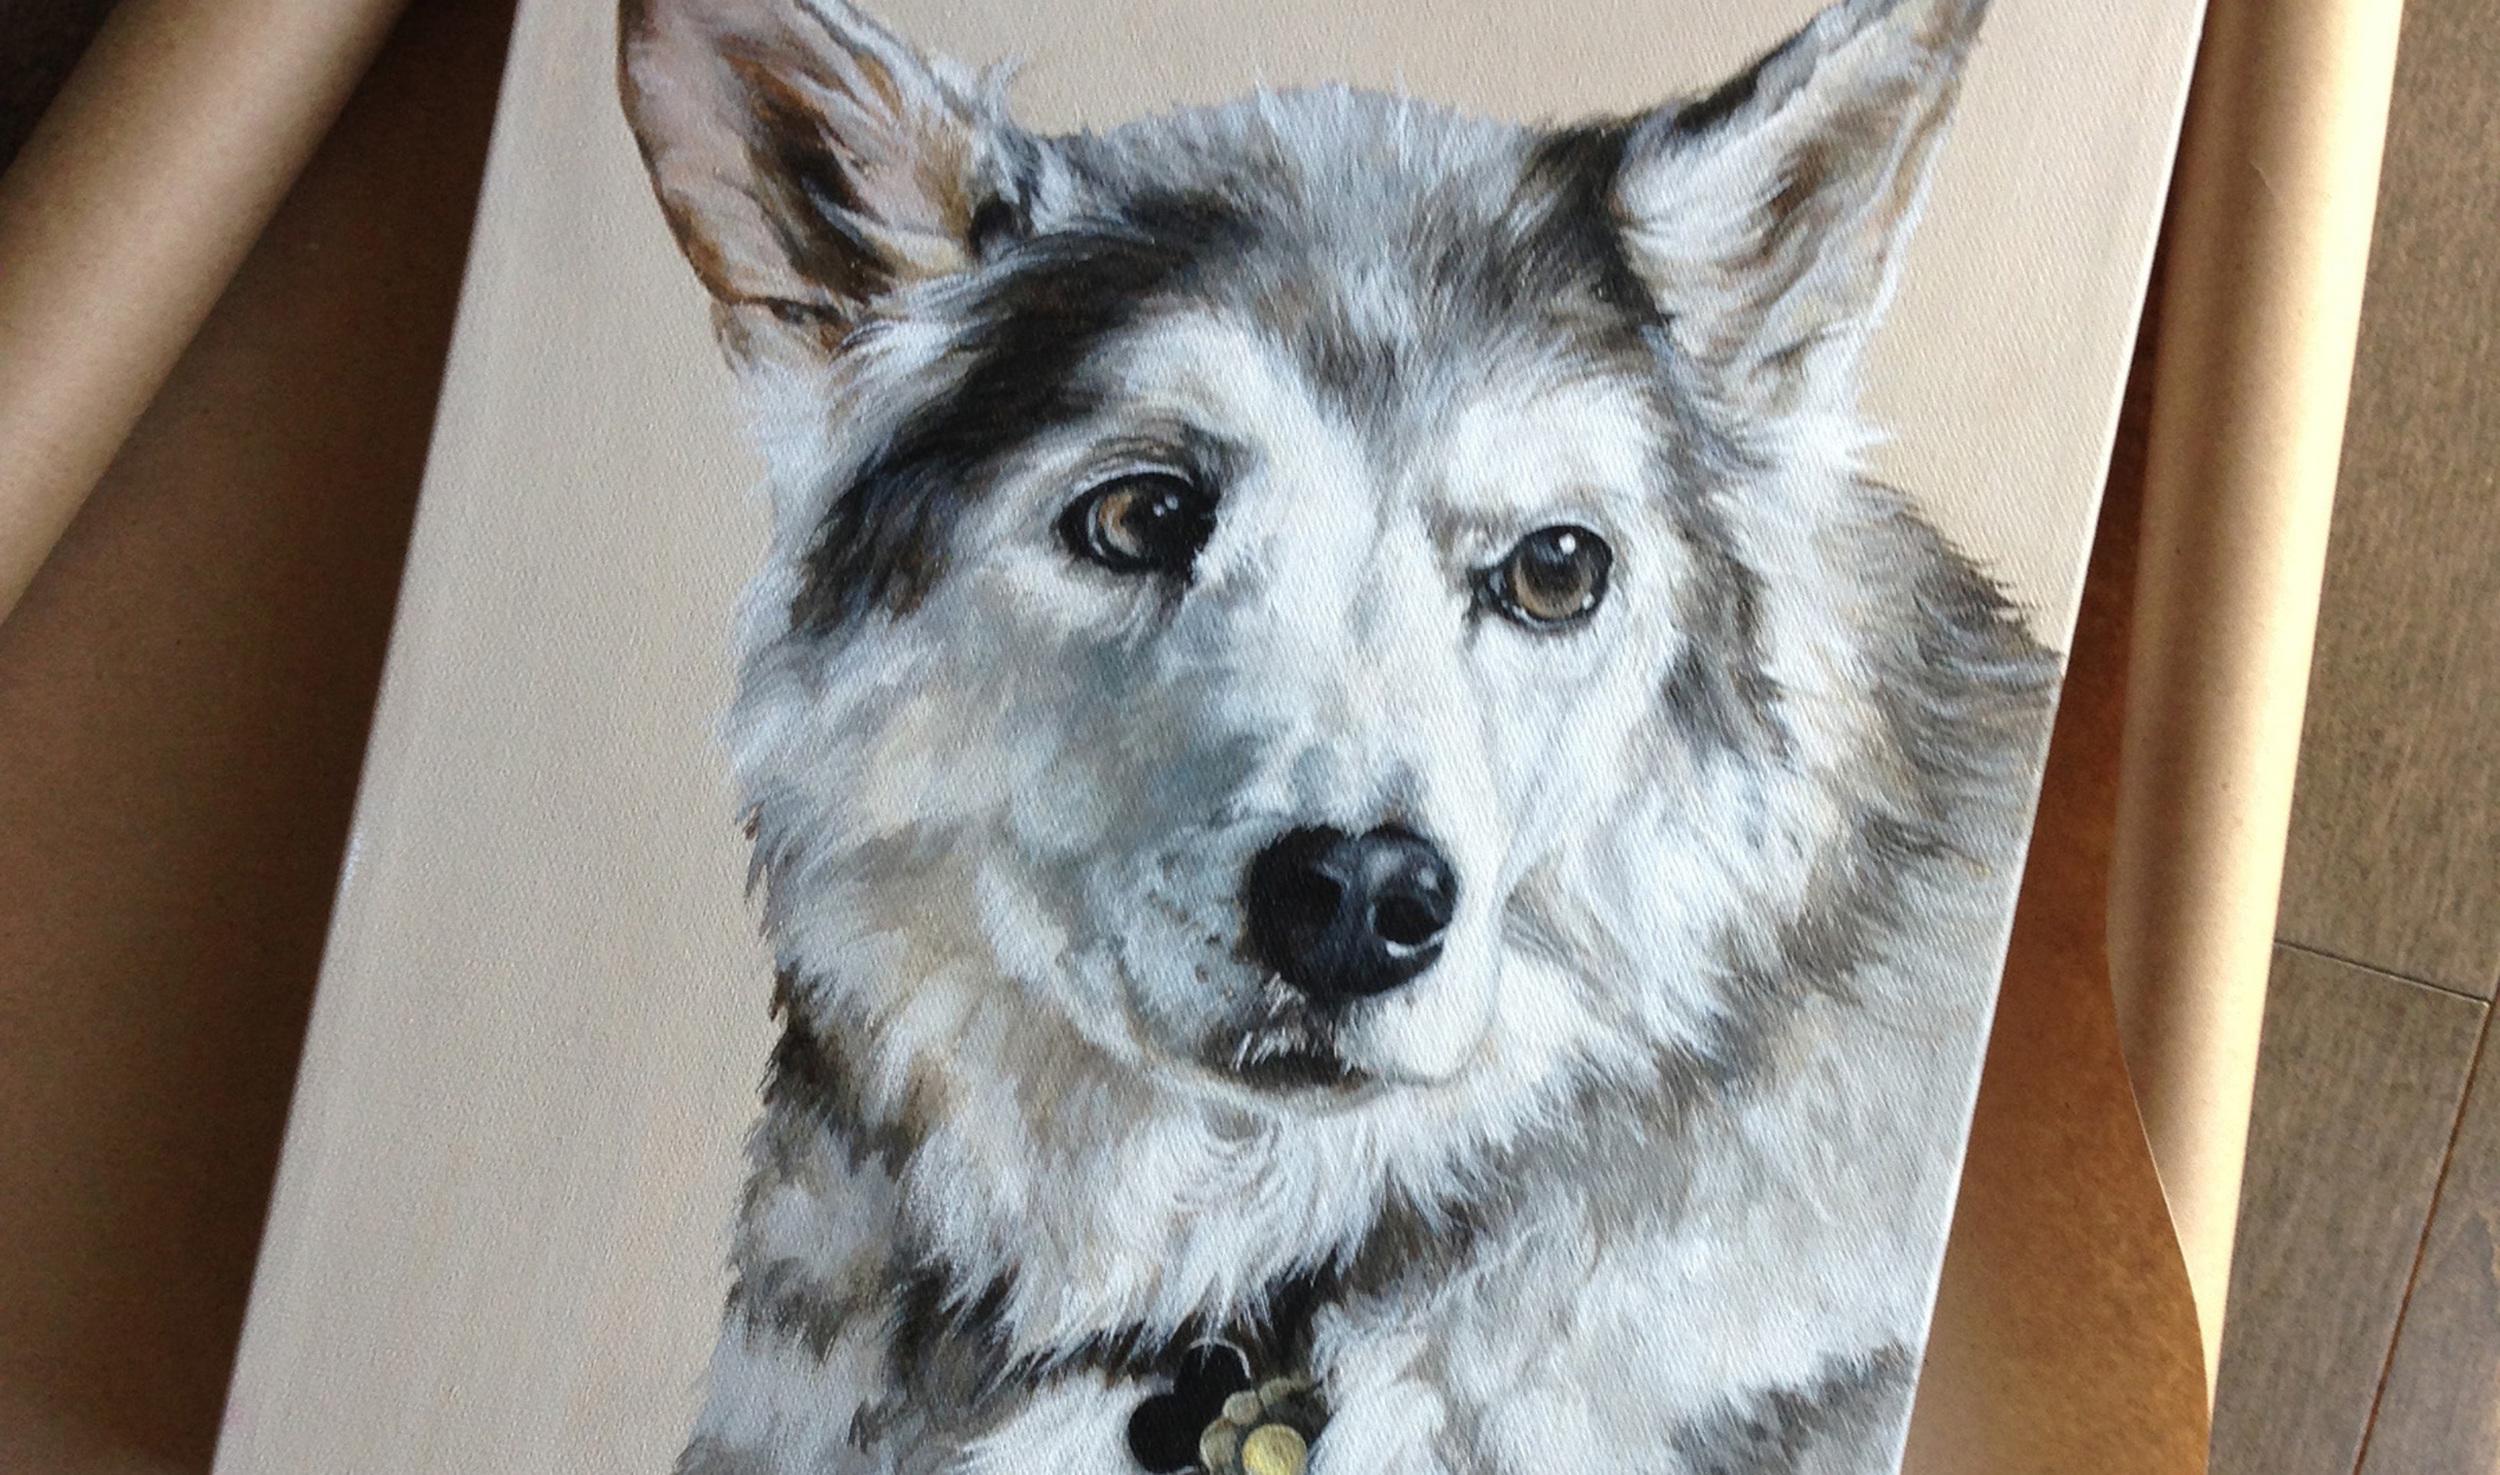 Husk/German Shepard mix portrait painting.